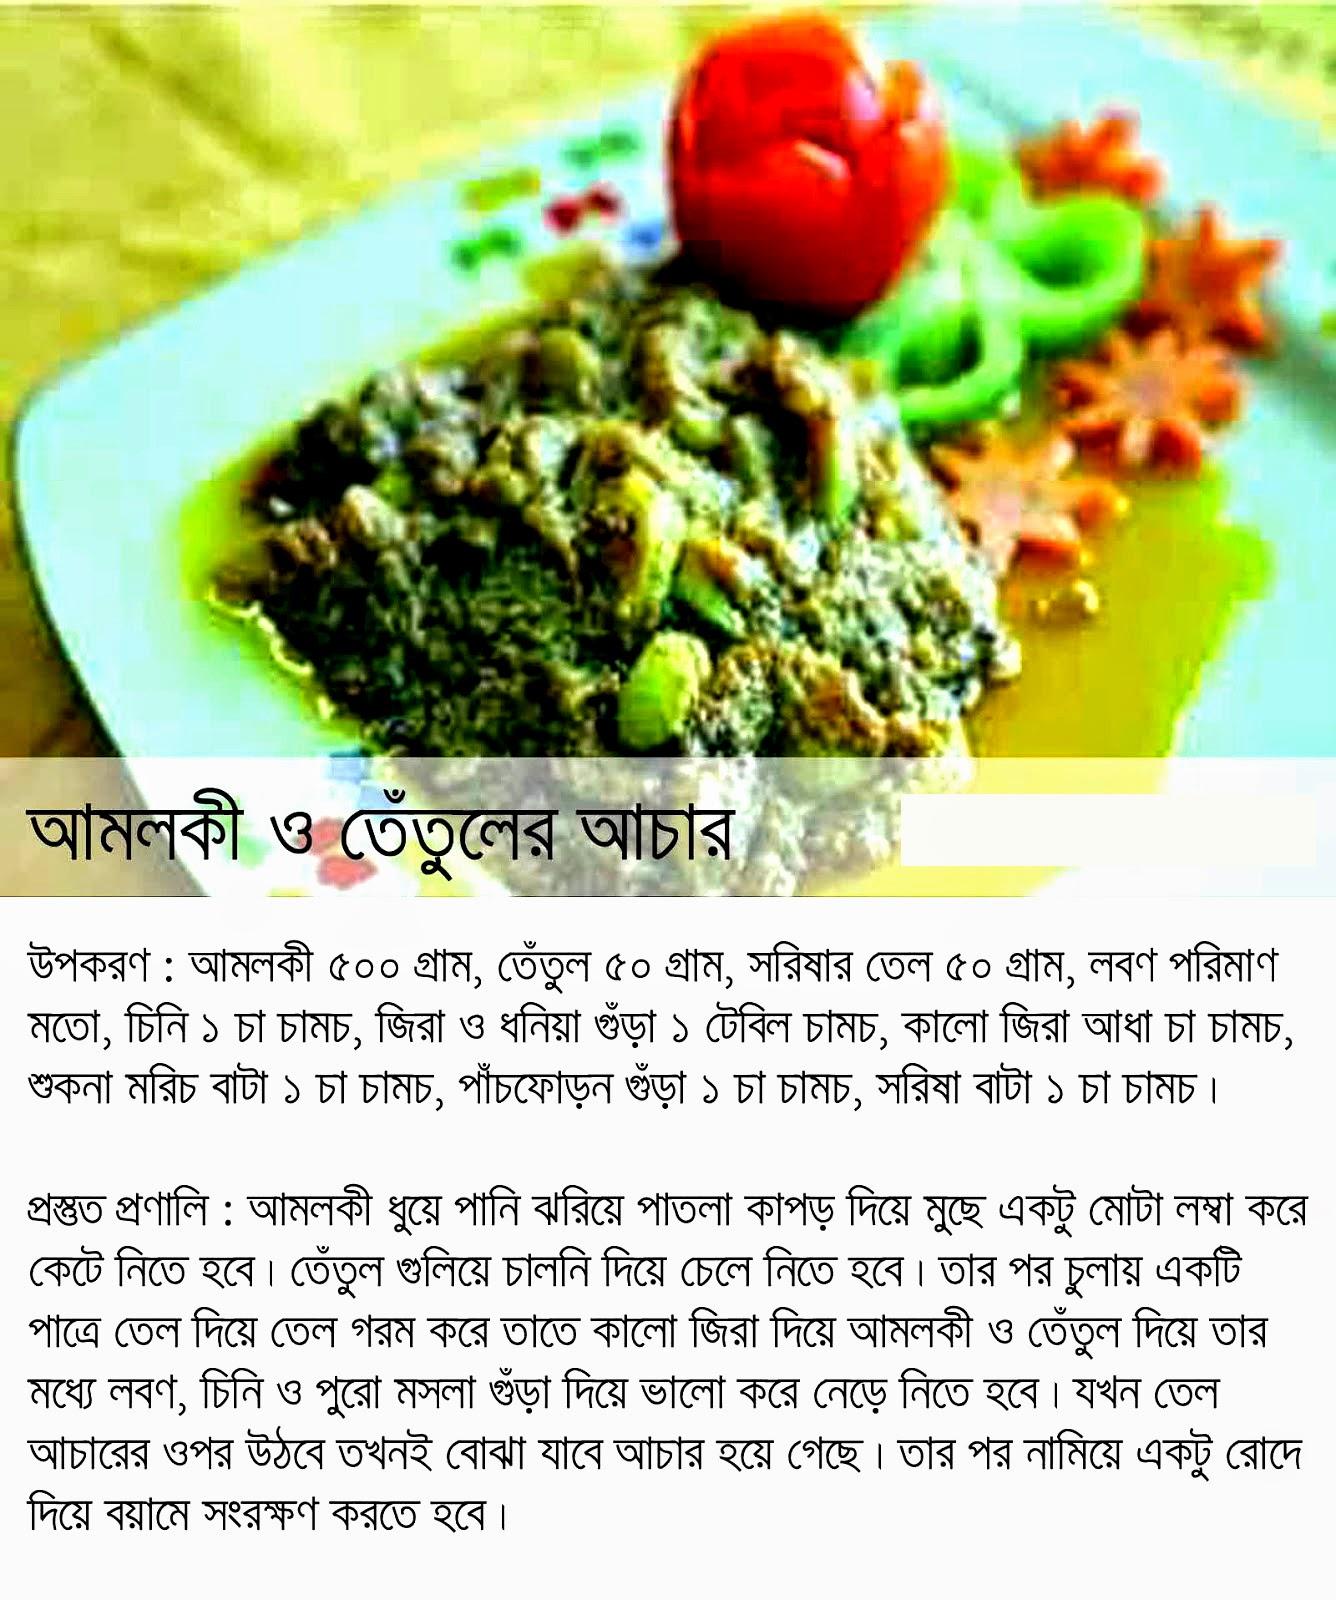 Bangladeshi food recipe amlokki o tetuler acher bangla recipe amlokki o tetuler acher bangla recipe forumfinder Choice Image